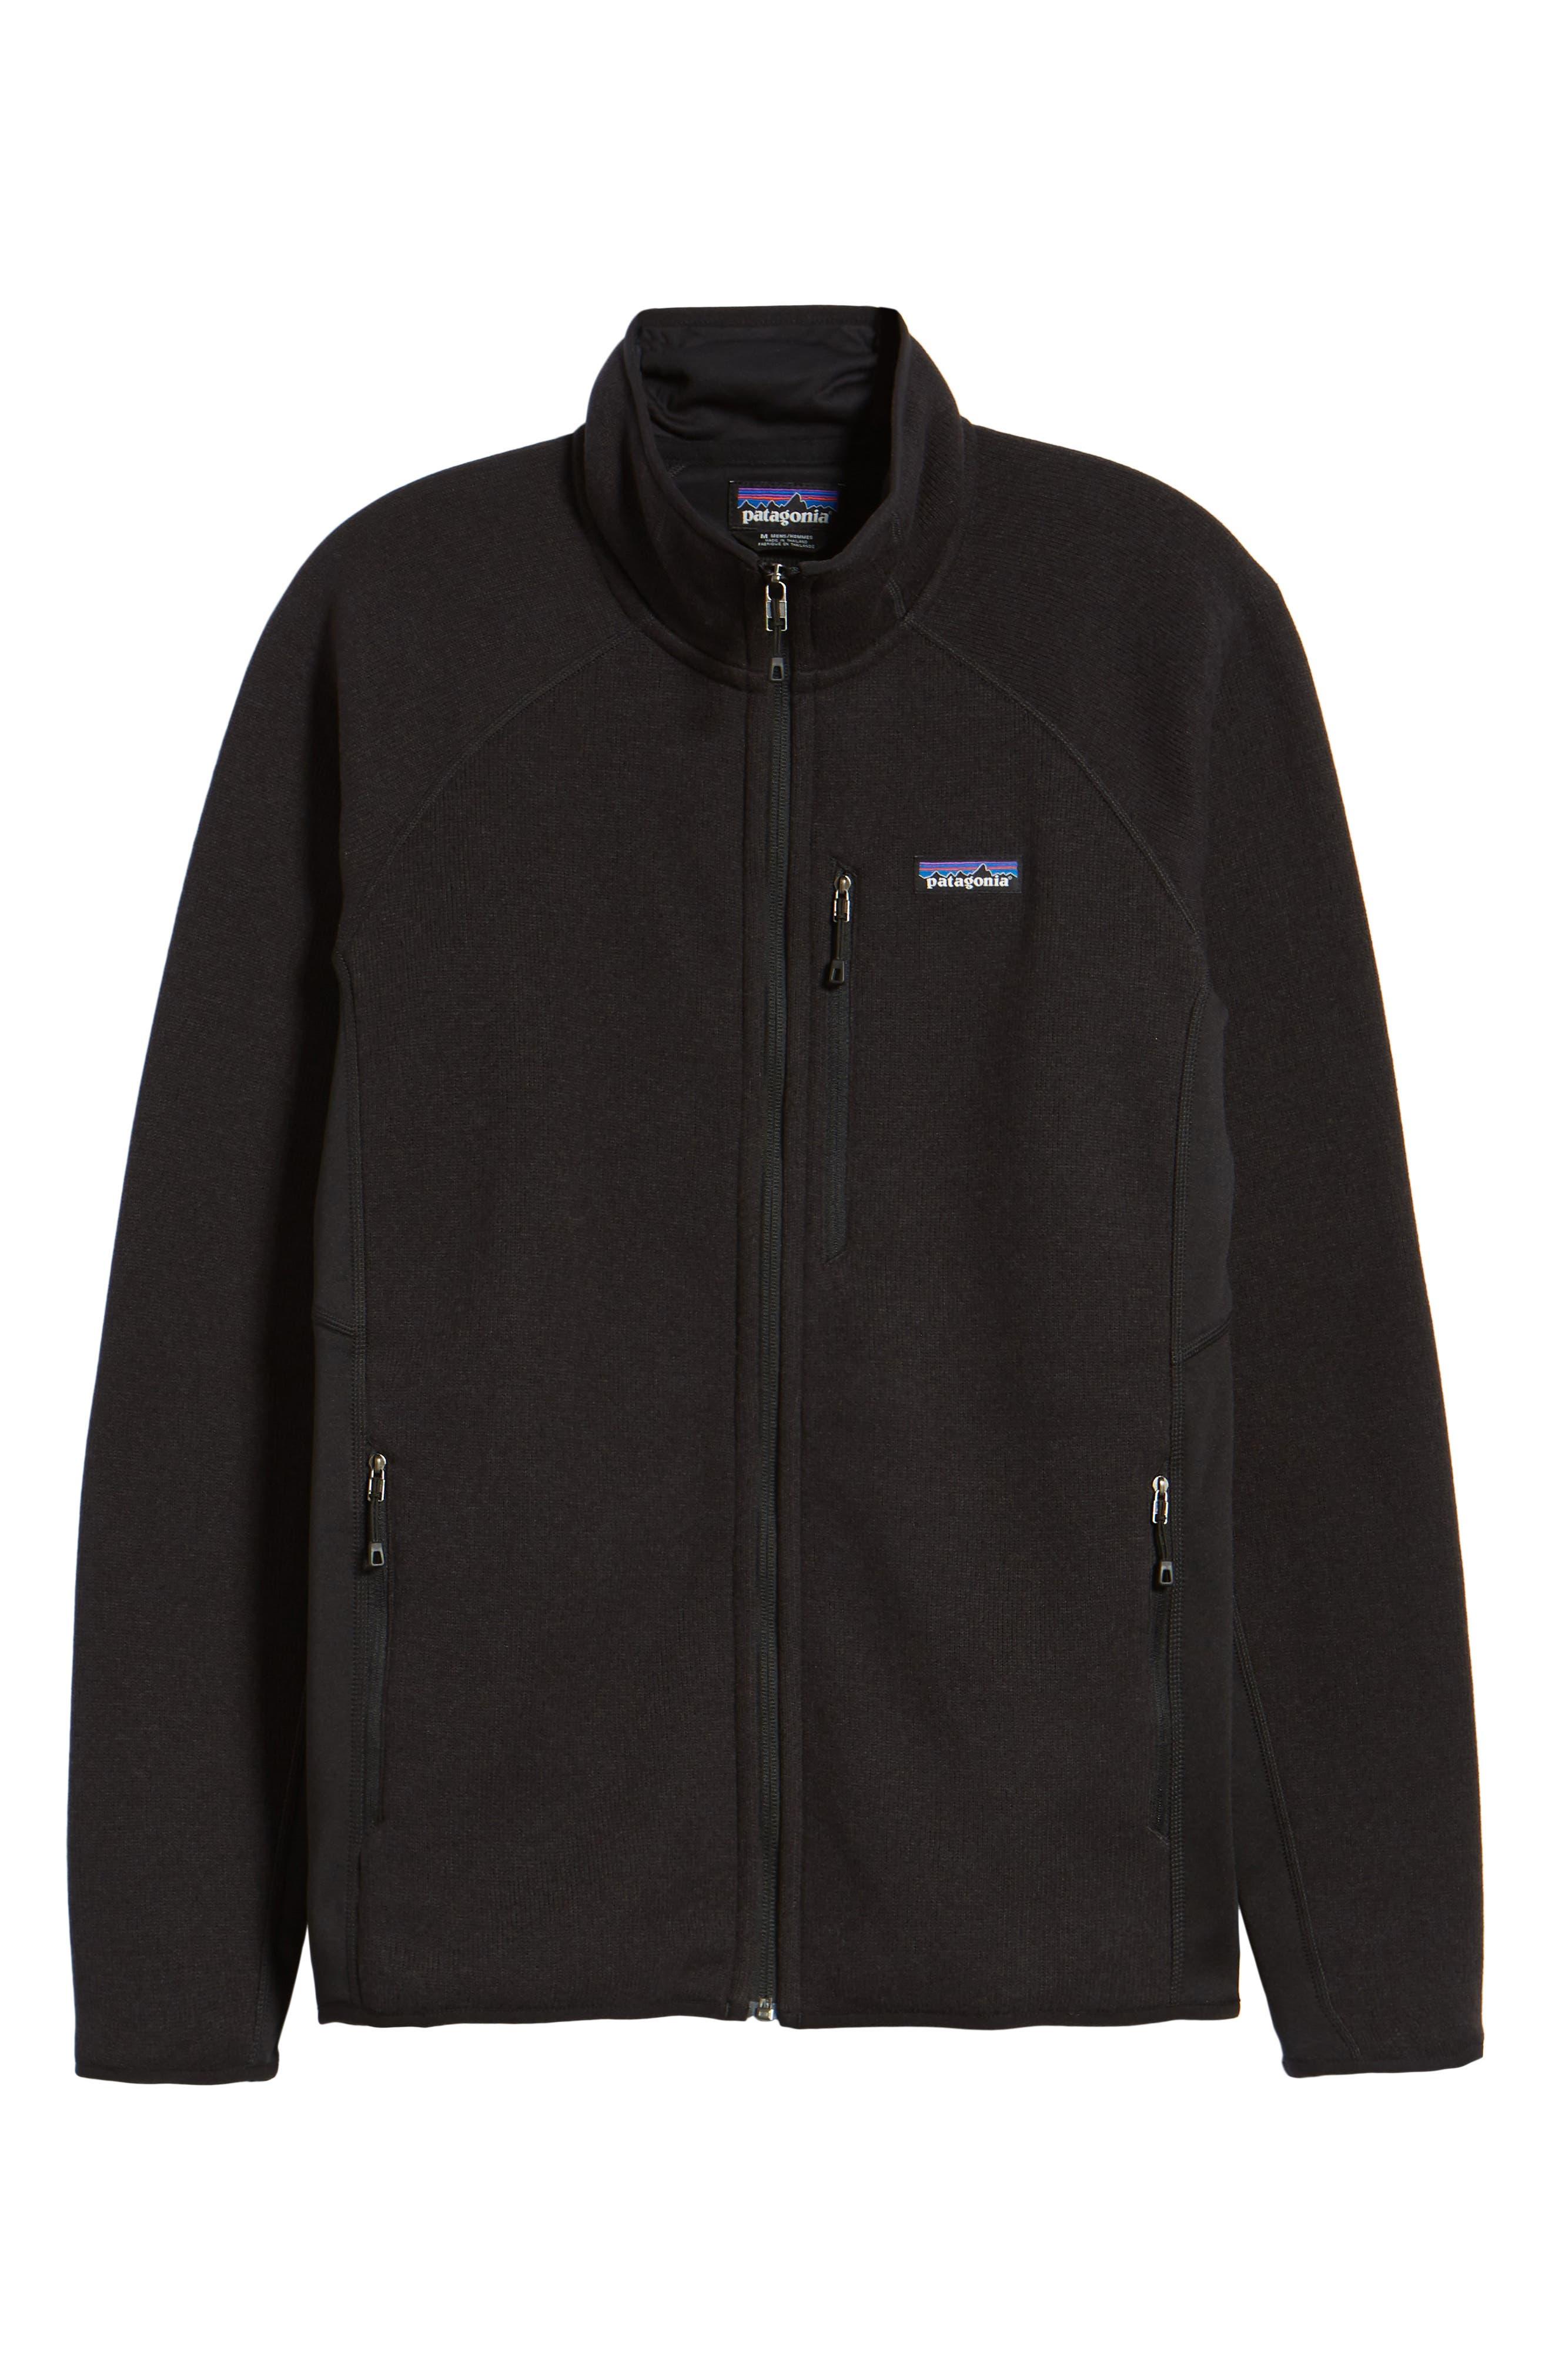 Better Sweater<sup>®</sup> Performance Slim Fit Zip Jacket,                             Alternate thumbnail 6, color,                             BLK